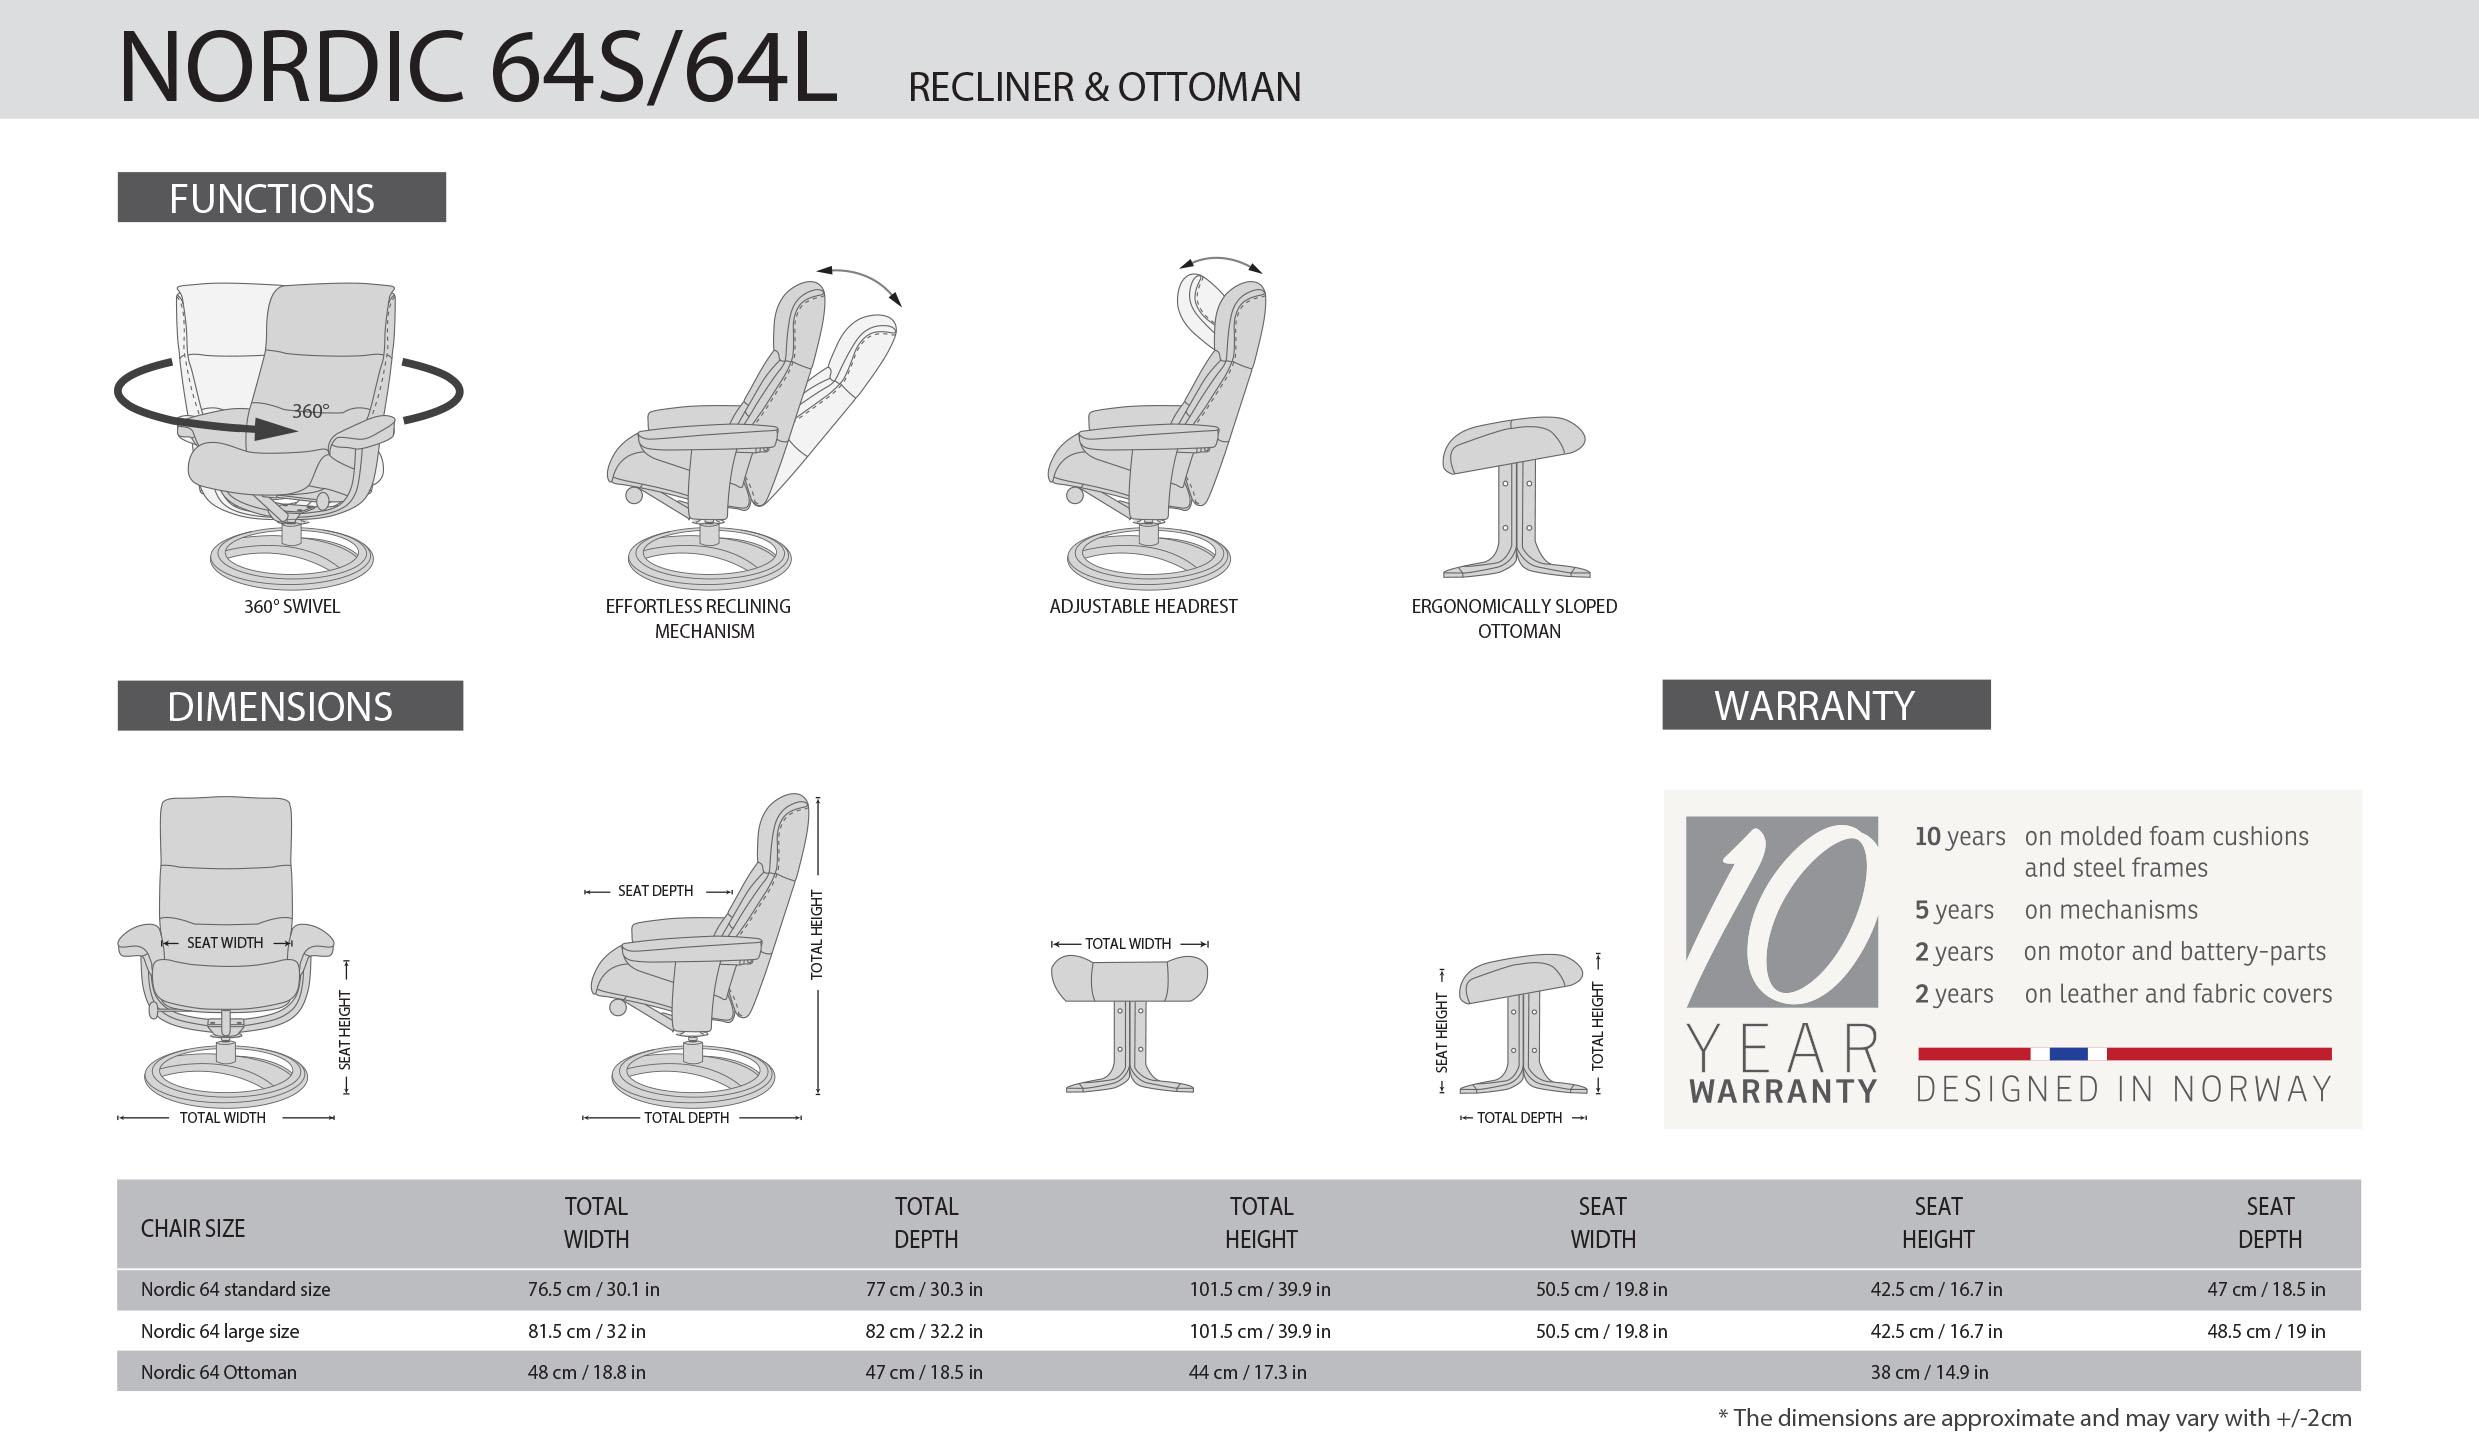 IMG Nordic 64S / 64L Recliner Dimensions